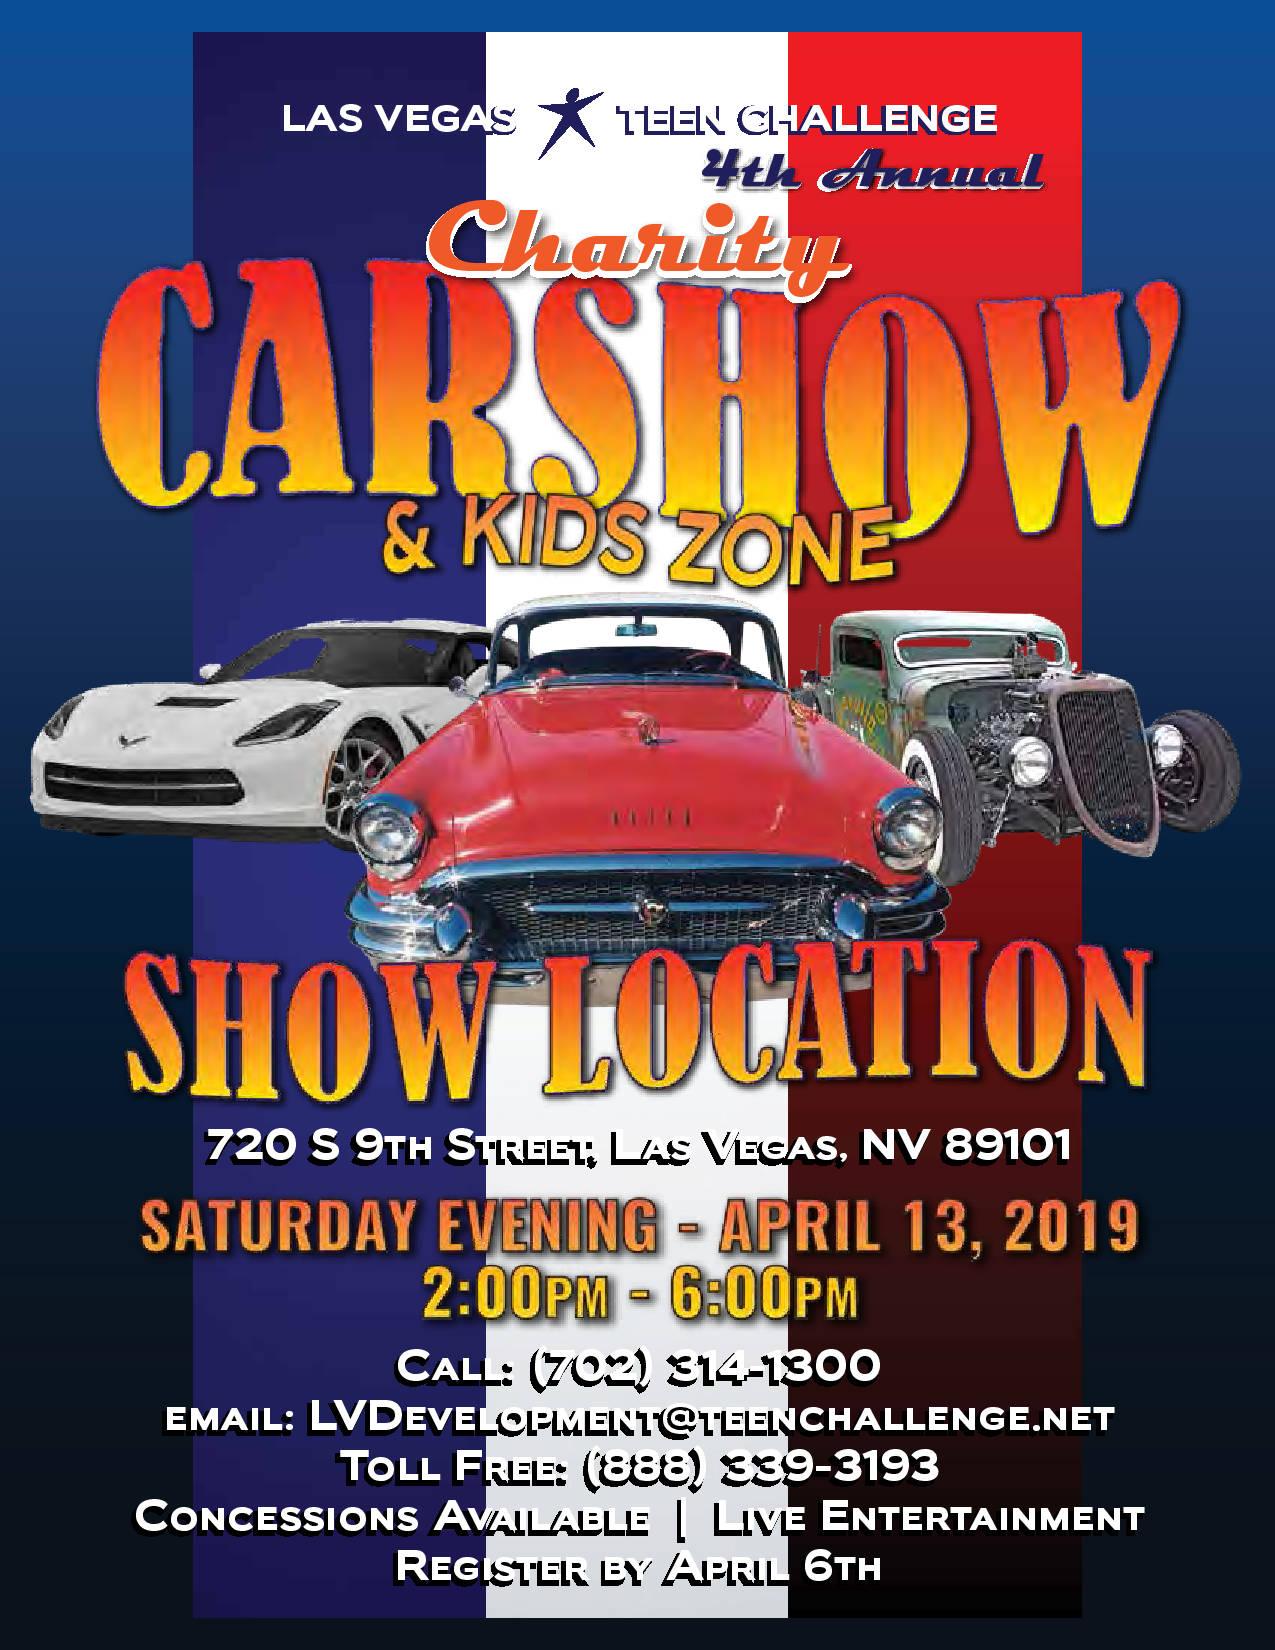 Rend Collective Las Vegas October 27, 2018